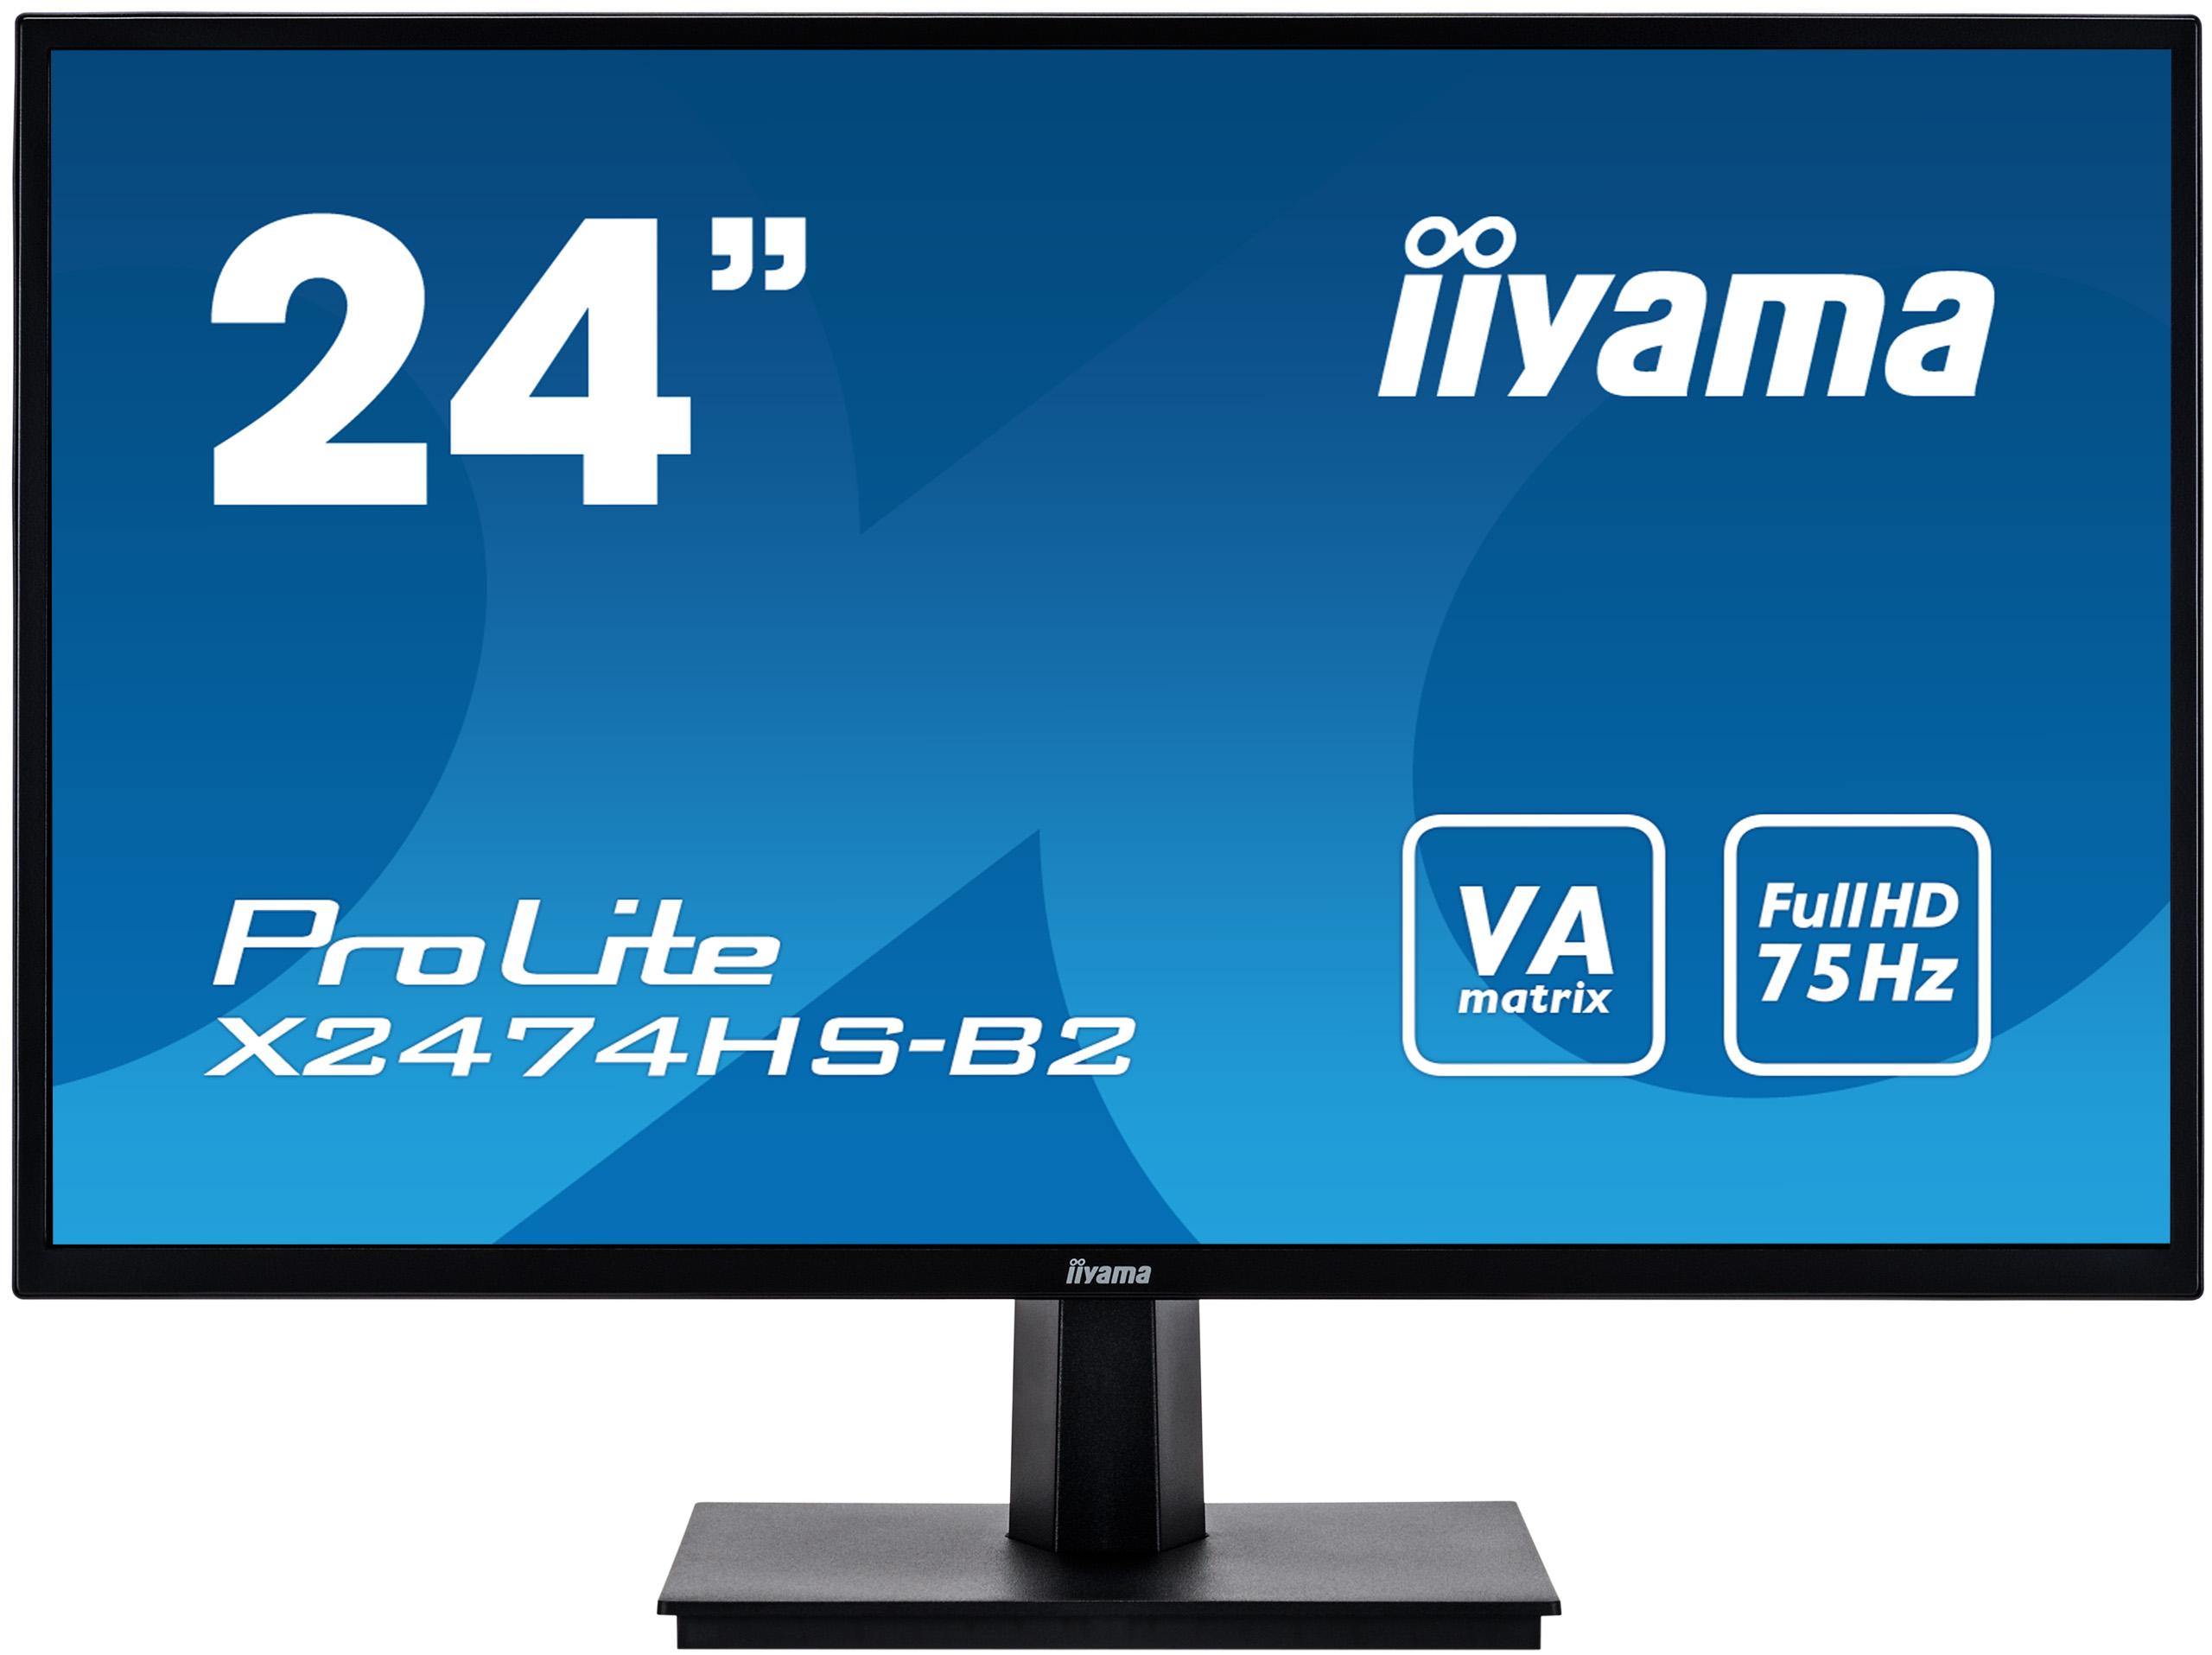 "24"" iiyama X2474HS-B2: VA, FullHD@75Hz, 250cd/m2, 4ms, VGA, HDMI, DP, černý"